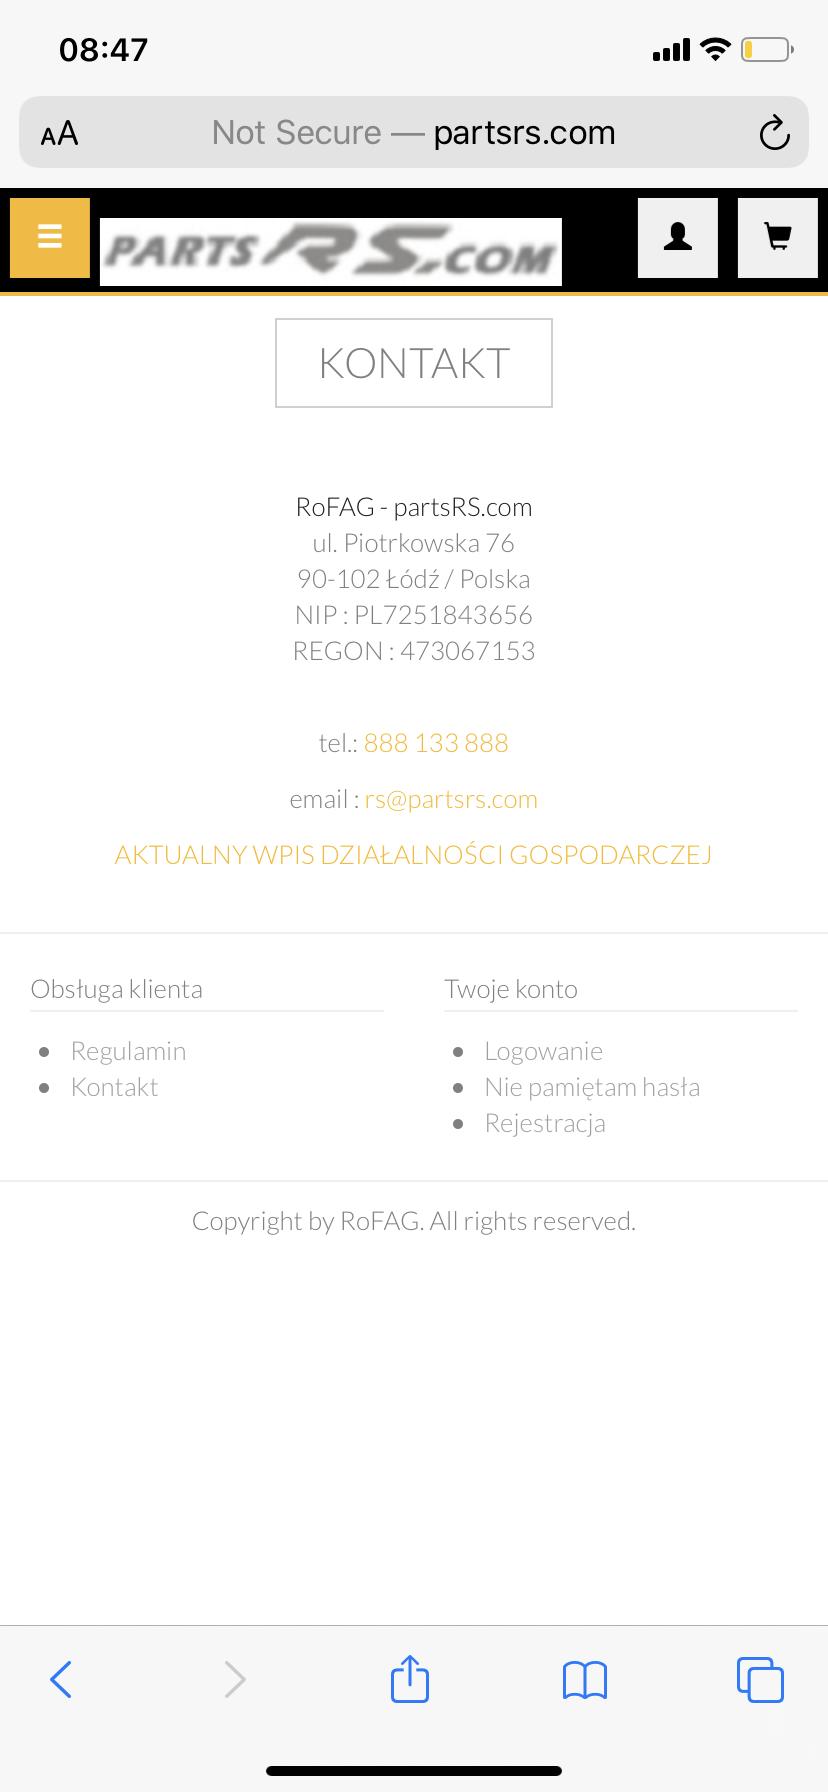 180F9342-9EF6-46E6-B7C4-5BDA15F7BB36.png